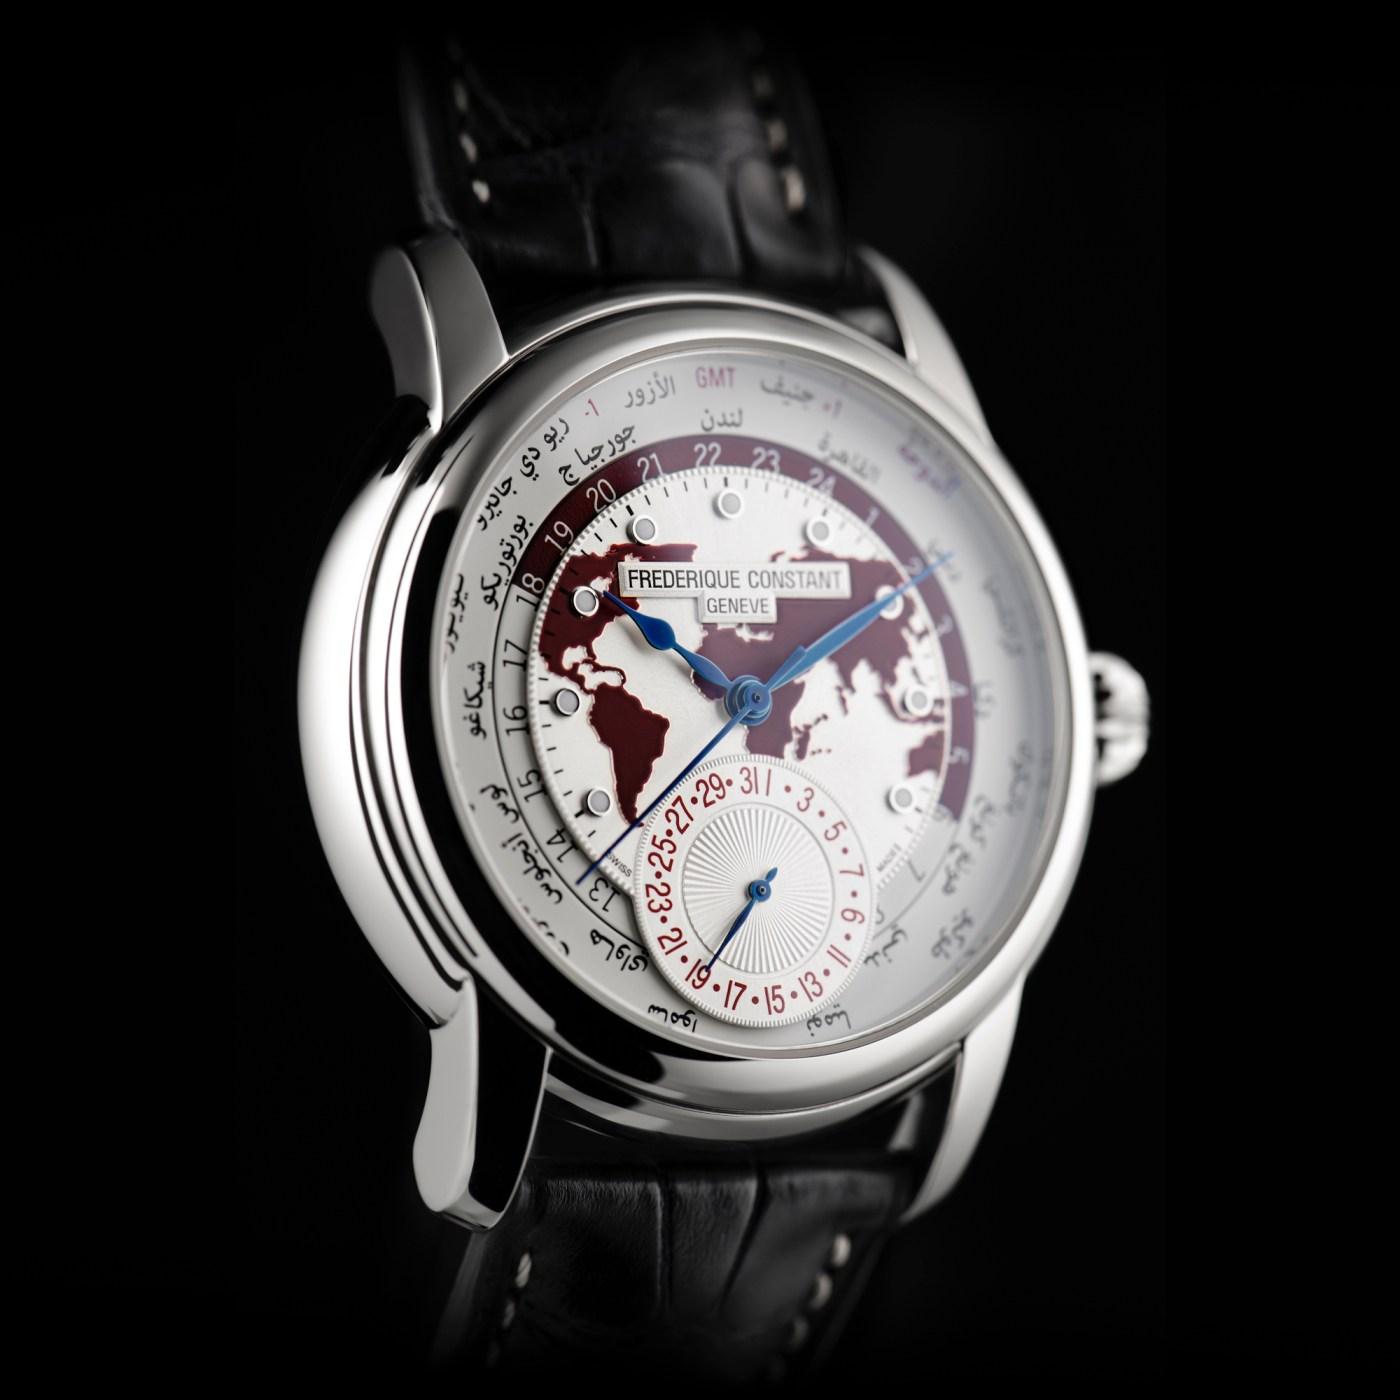 Classic Worldtimer Manufacture Qatar limited edition